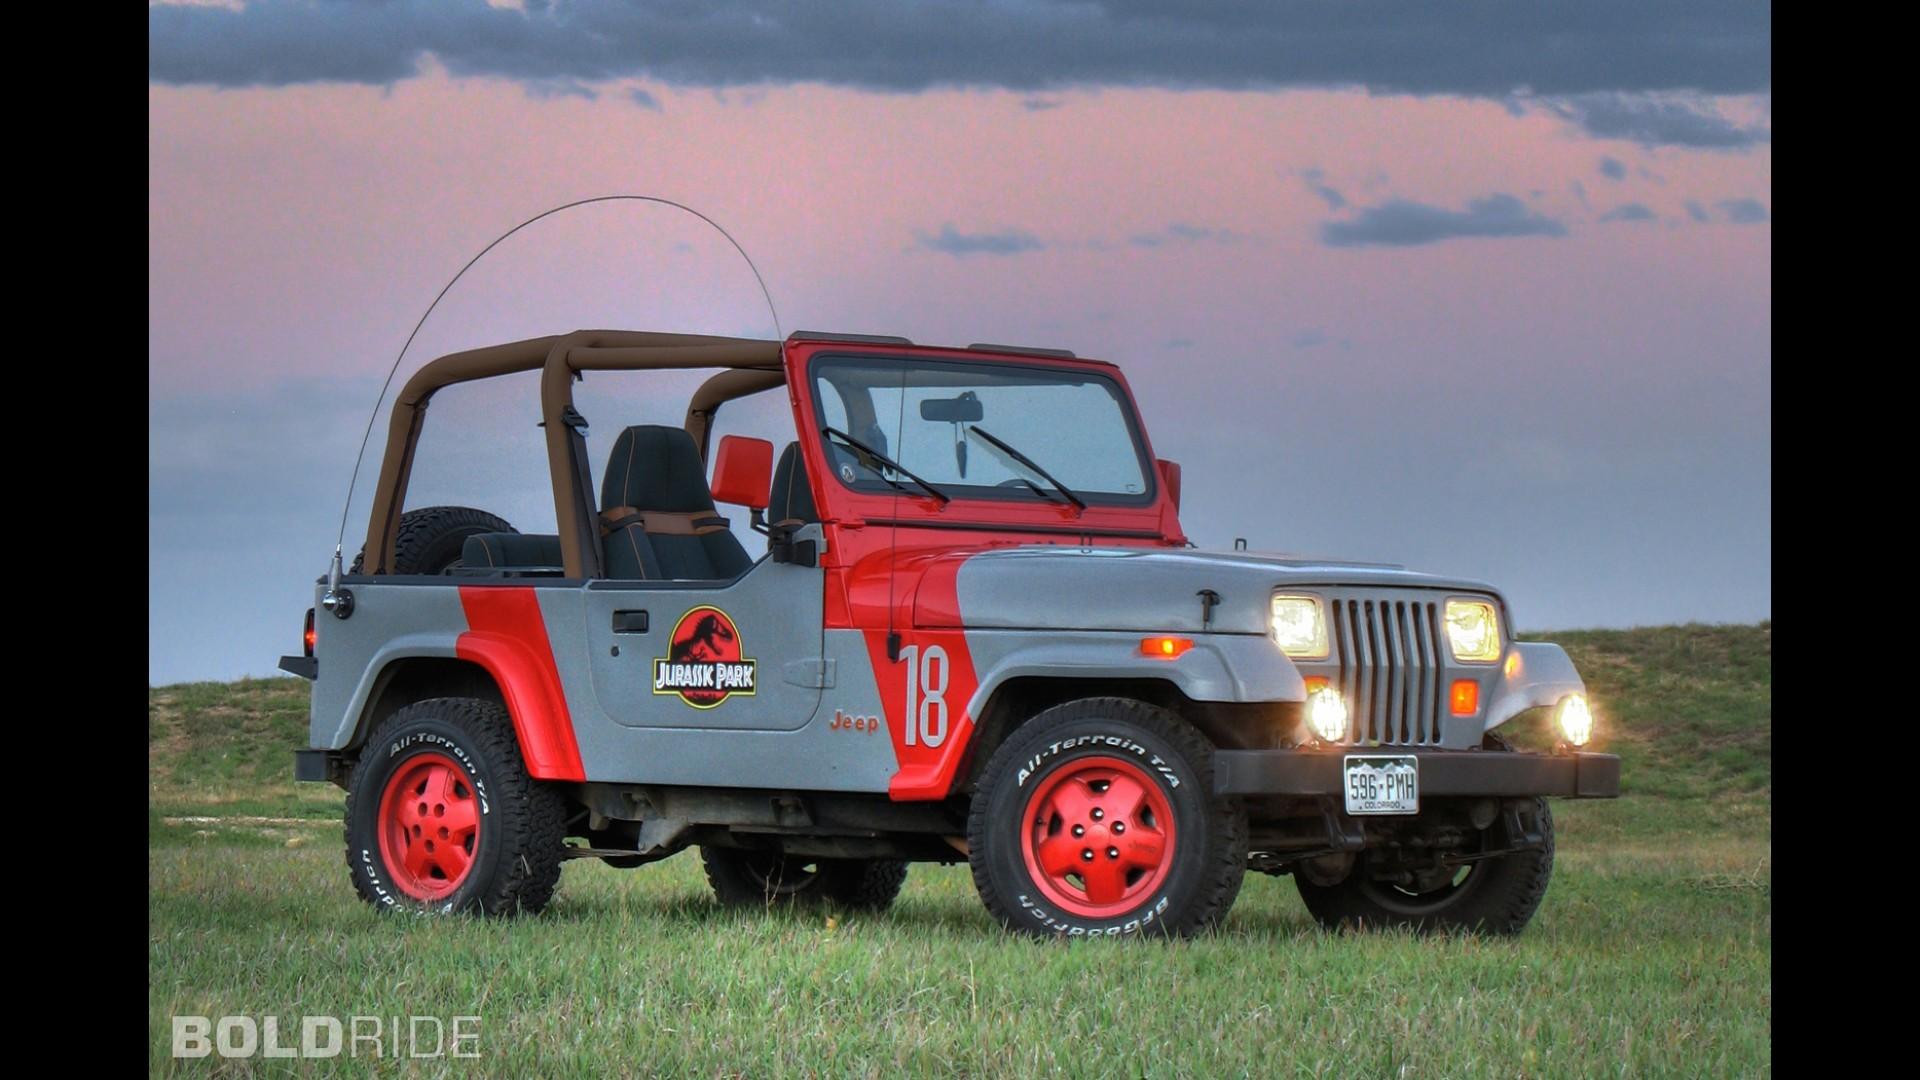 1999 Jeep Wrangler For Sale >> Jeep Wrangler Jurassic Park